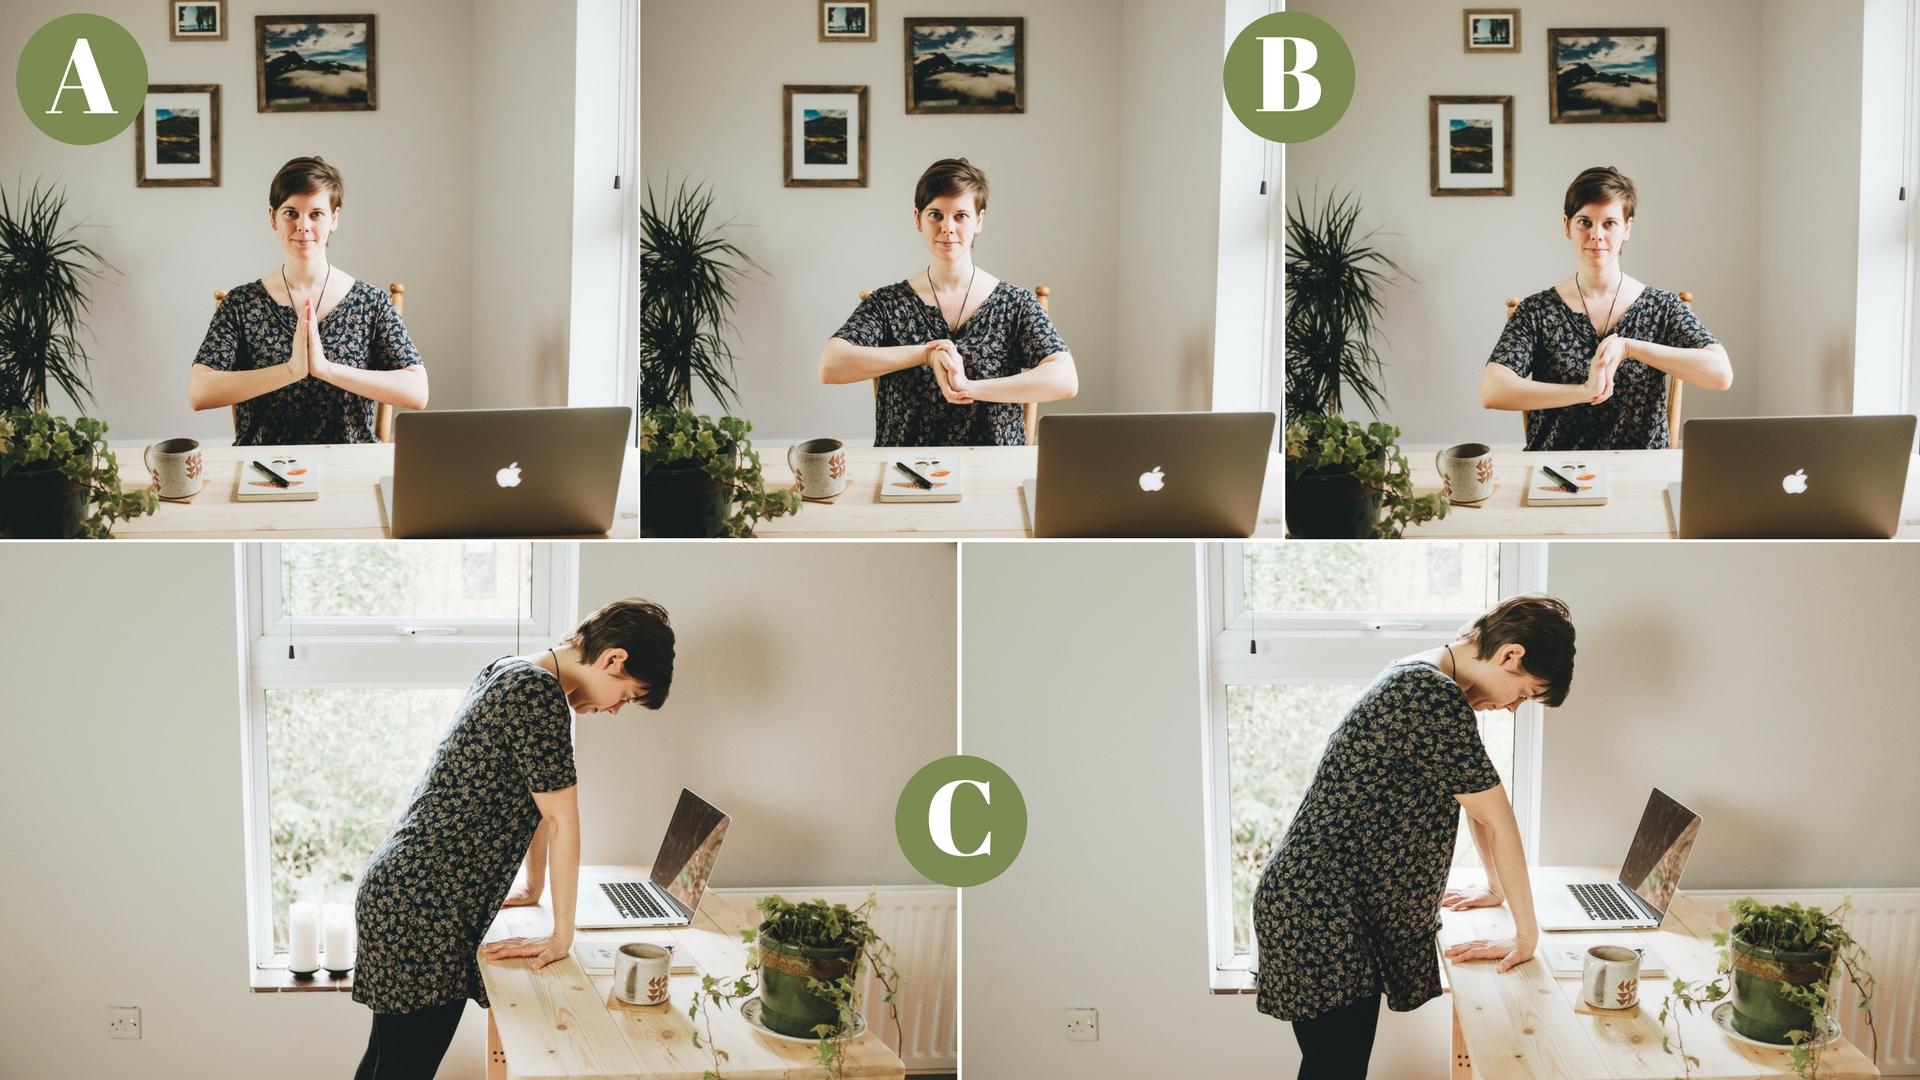 5-10min Desk Yoga for Photographers - Yoga for Wrists